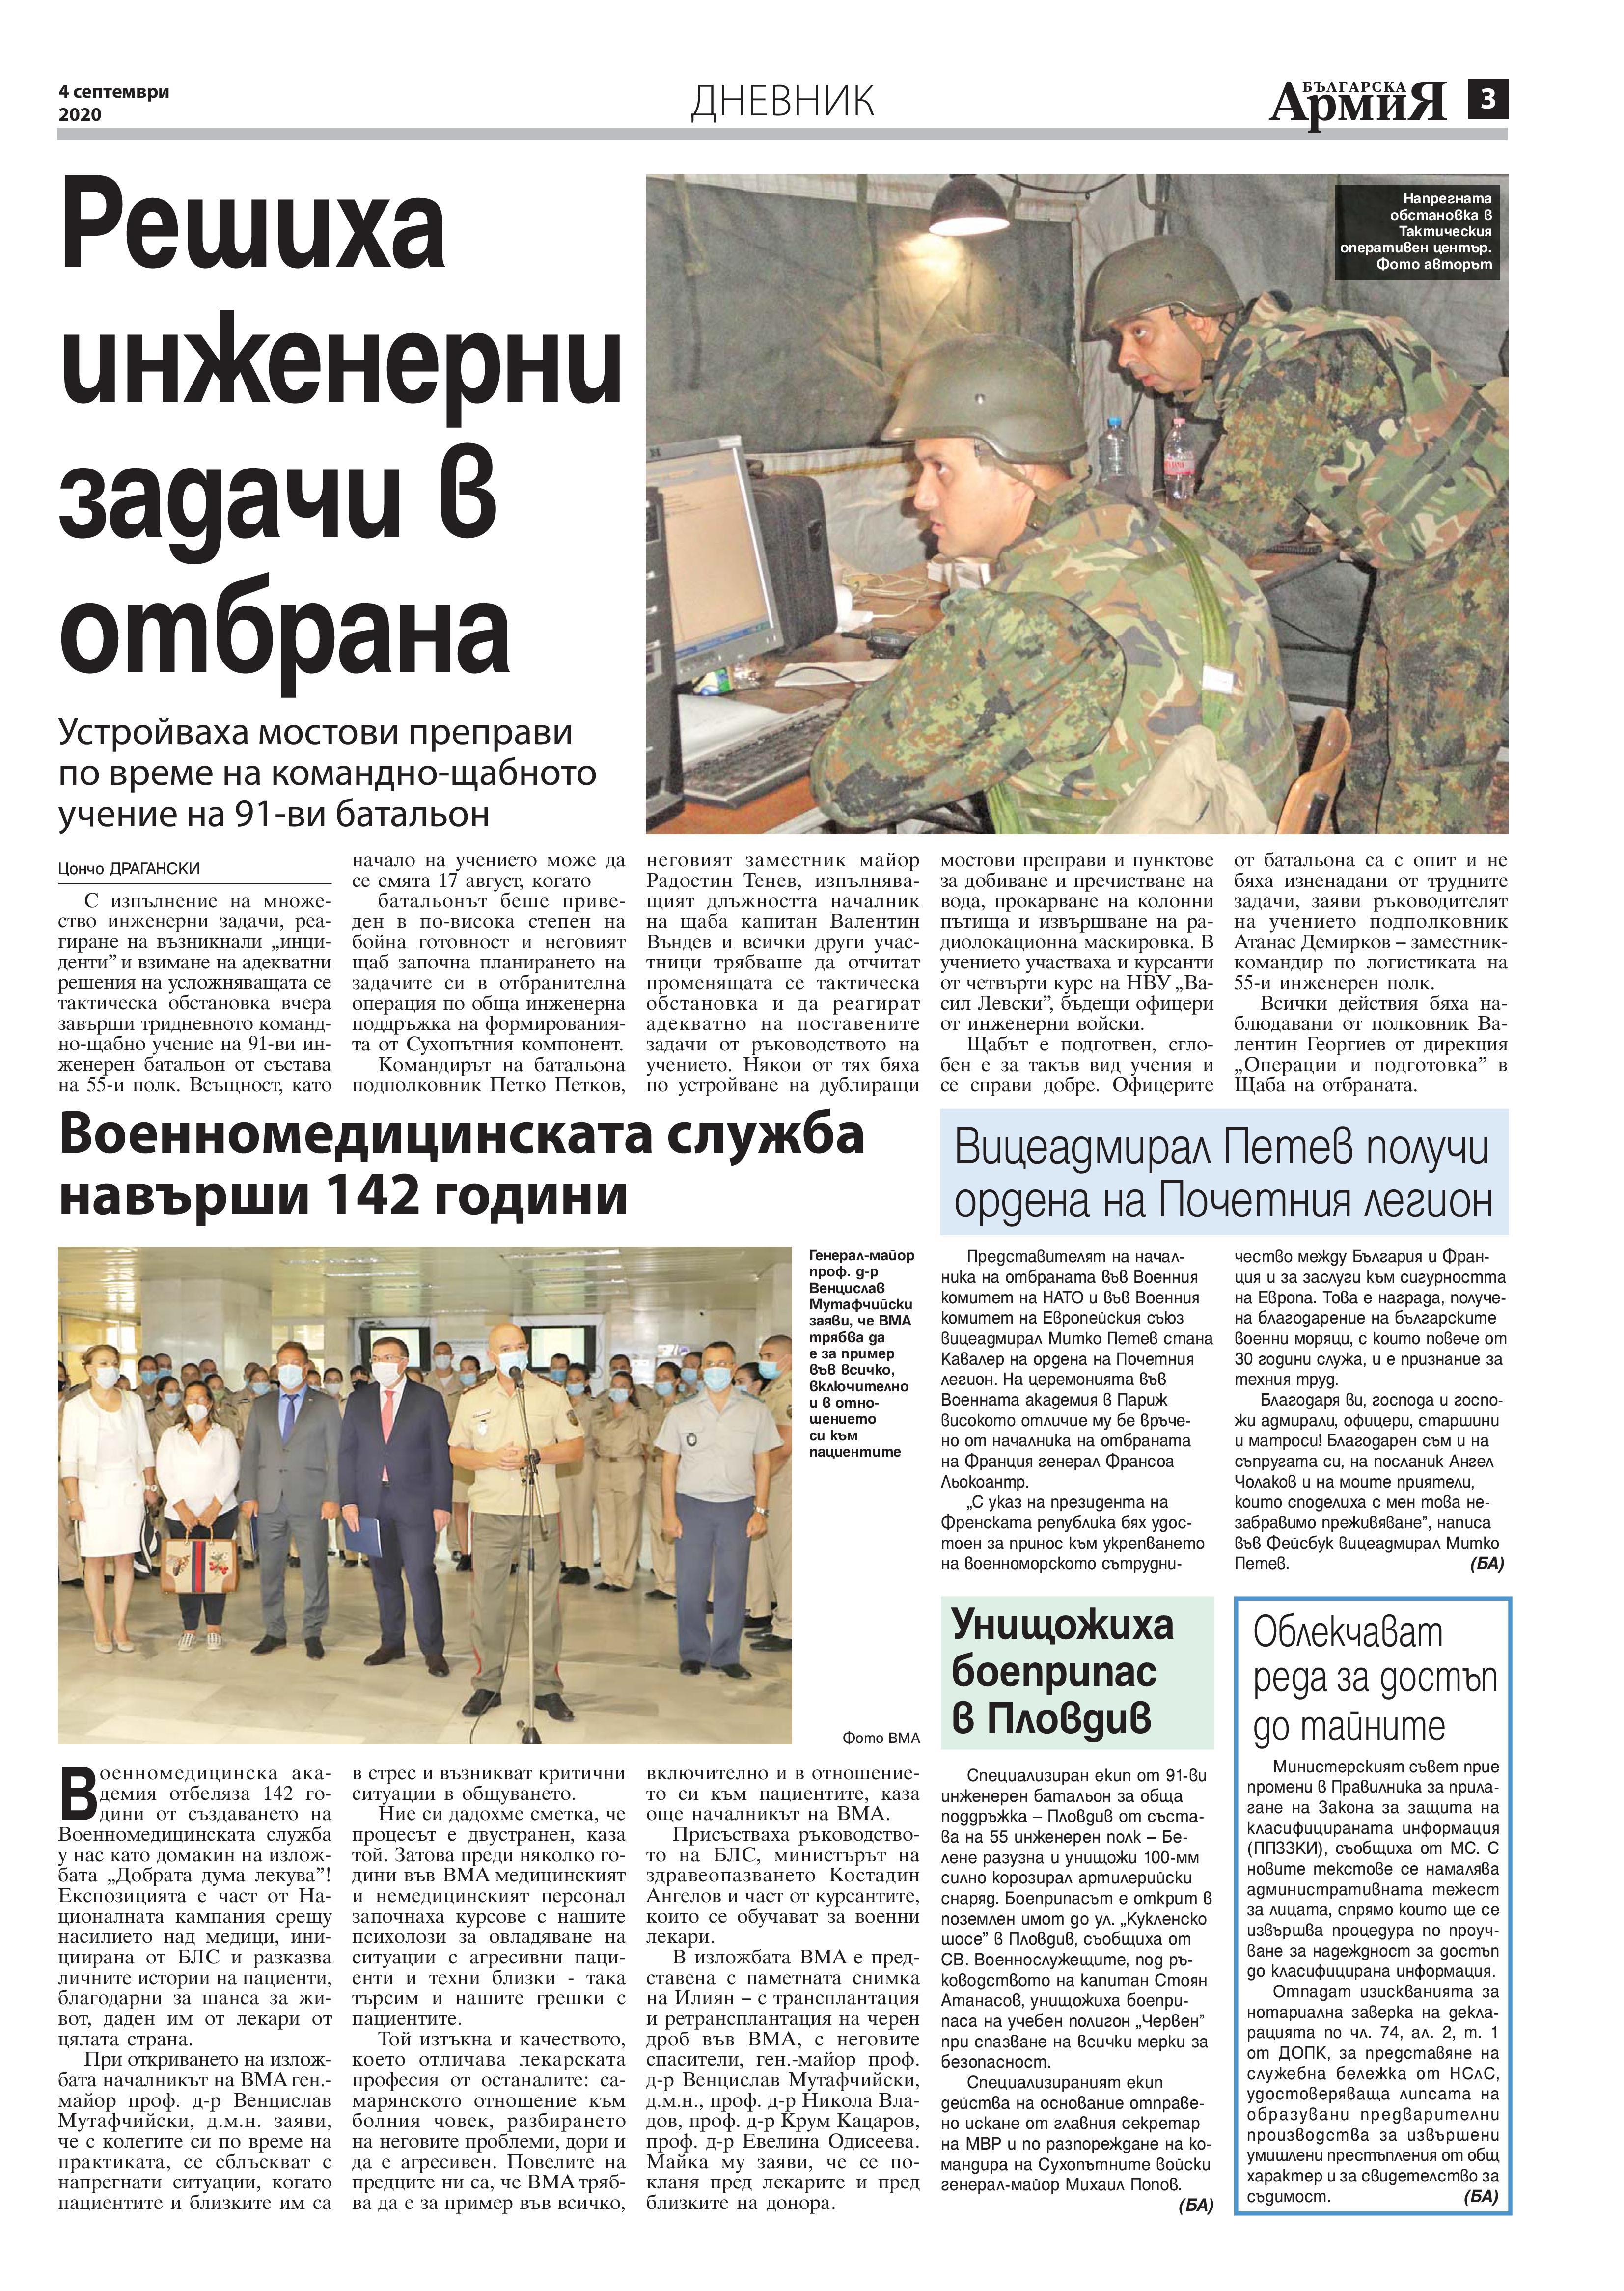 https://www.armymedia.bg/wp-content/uploads/2015/06/03-38.jpg